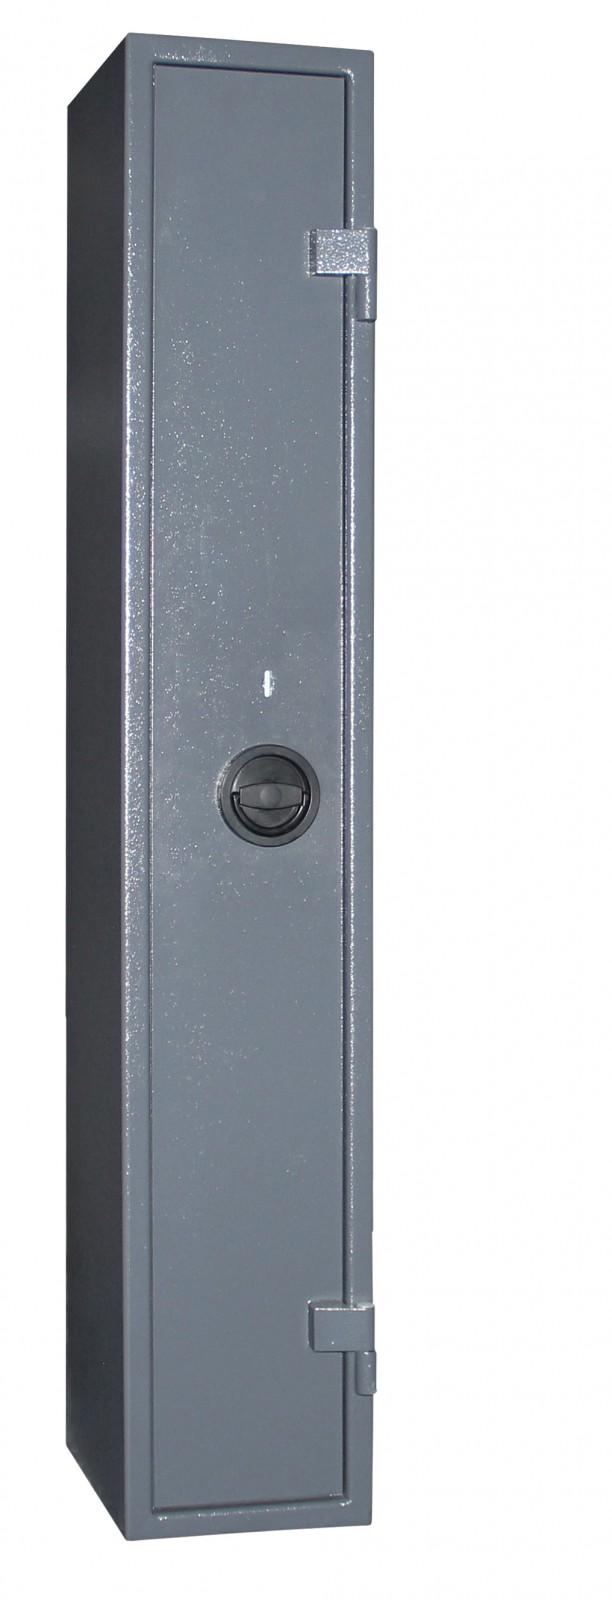 format waffenschrank sicherheitsstufe a vdma 24992 waffen 3 langwaffen munitionsschrank. Black Bedroom Furniture Sets. Home Design Ideas